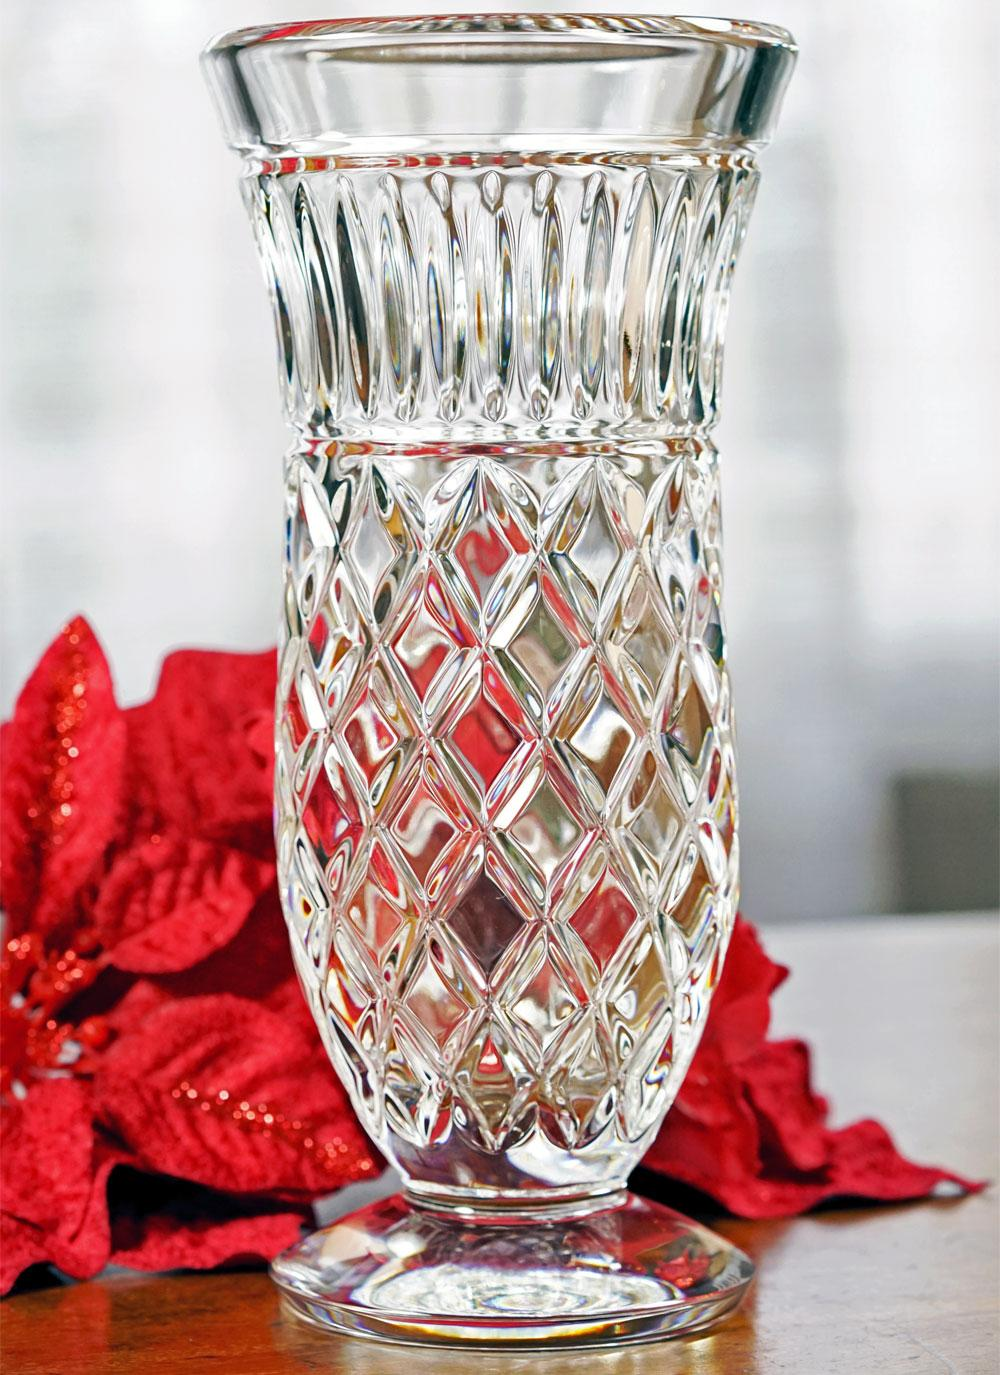 Waterford Crystal Marlene 8 Inch Footed Vase Blarney